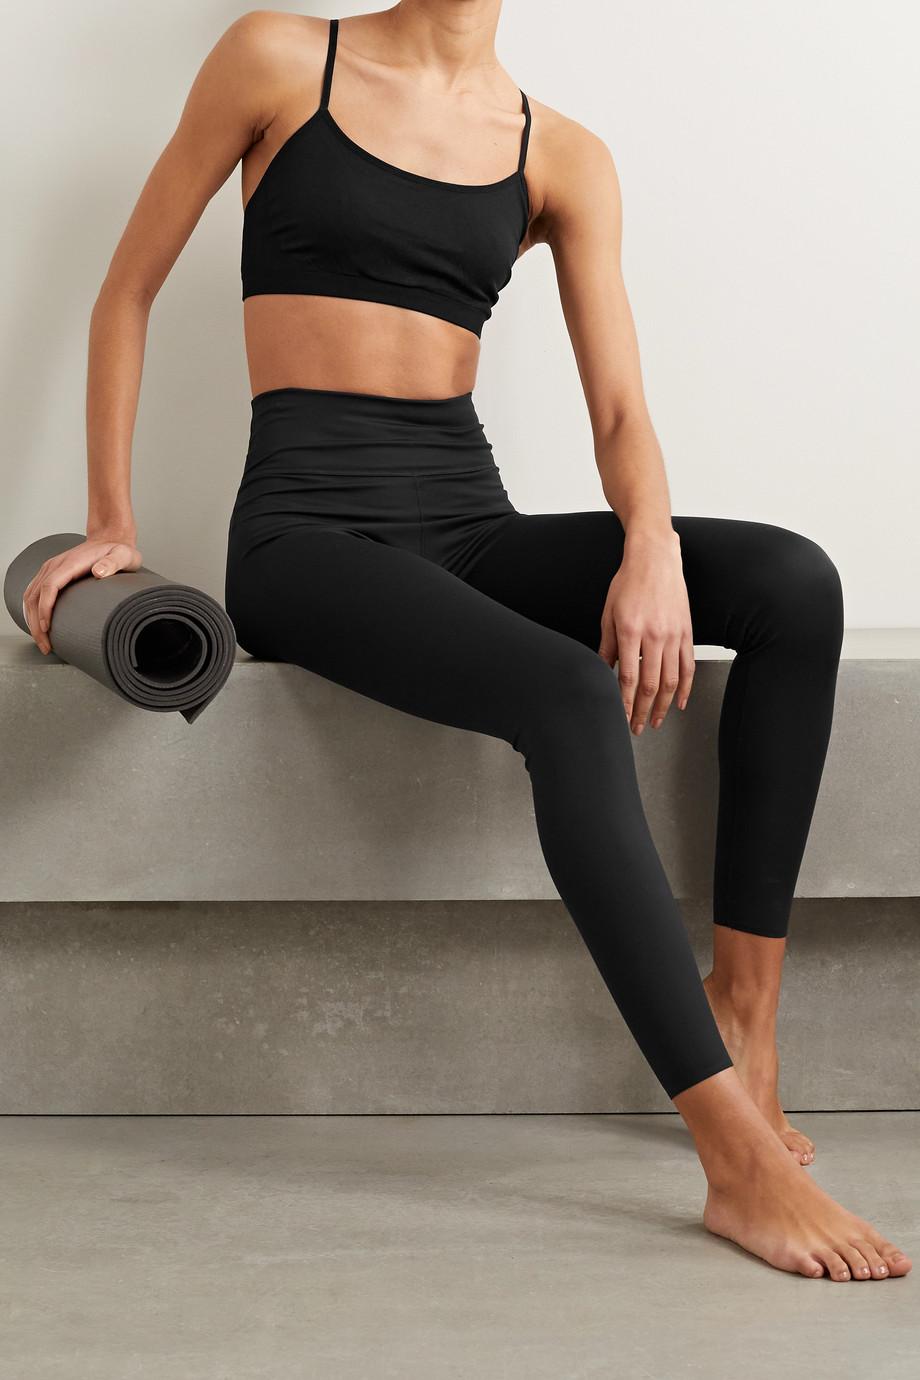 Splits59 Loren set of three stretch sports bras